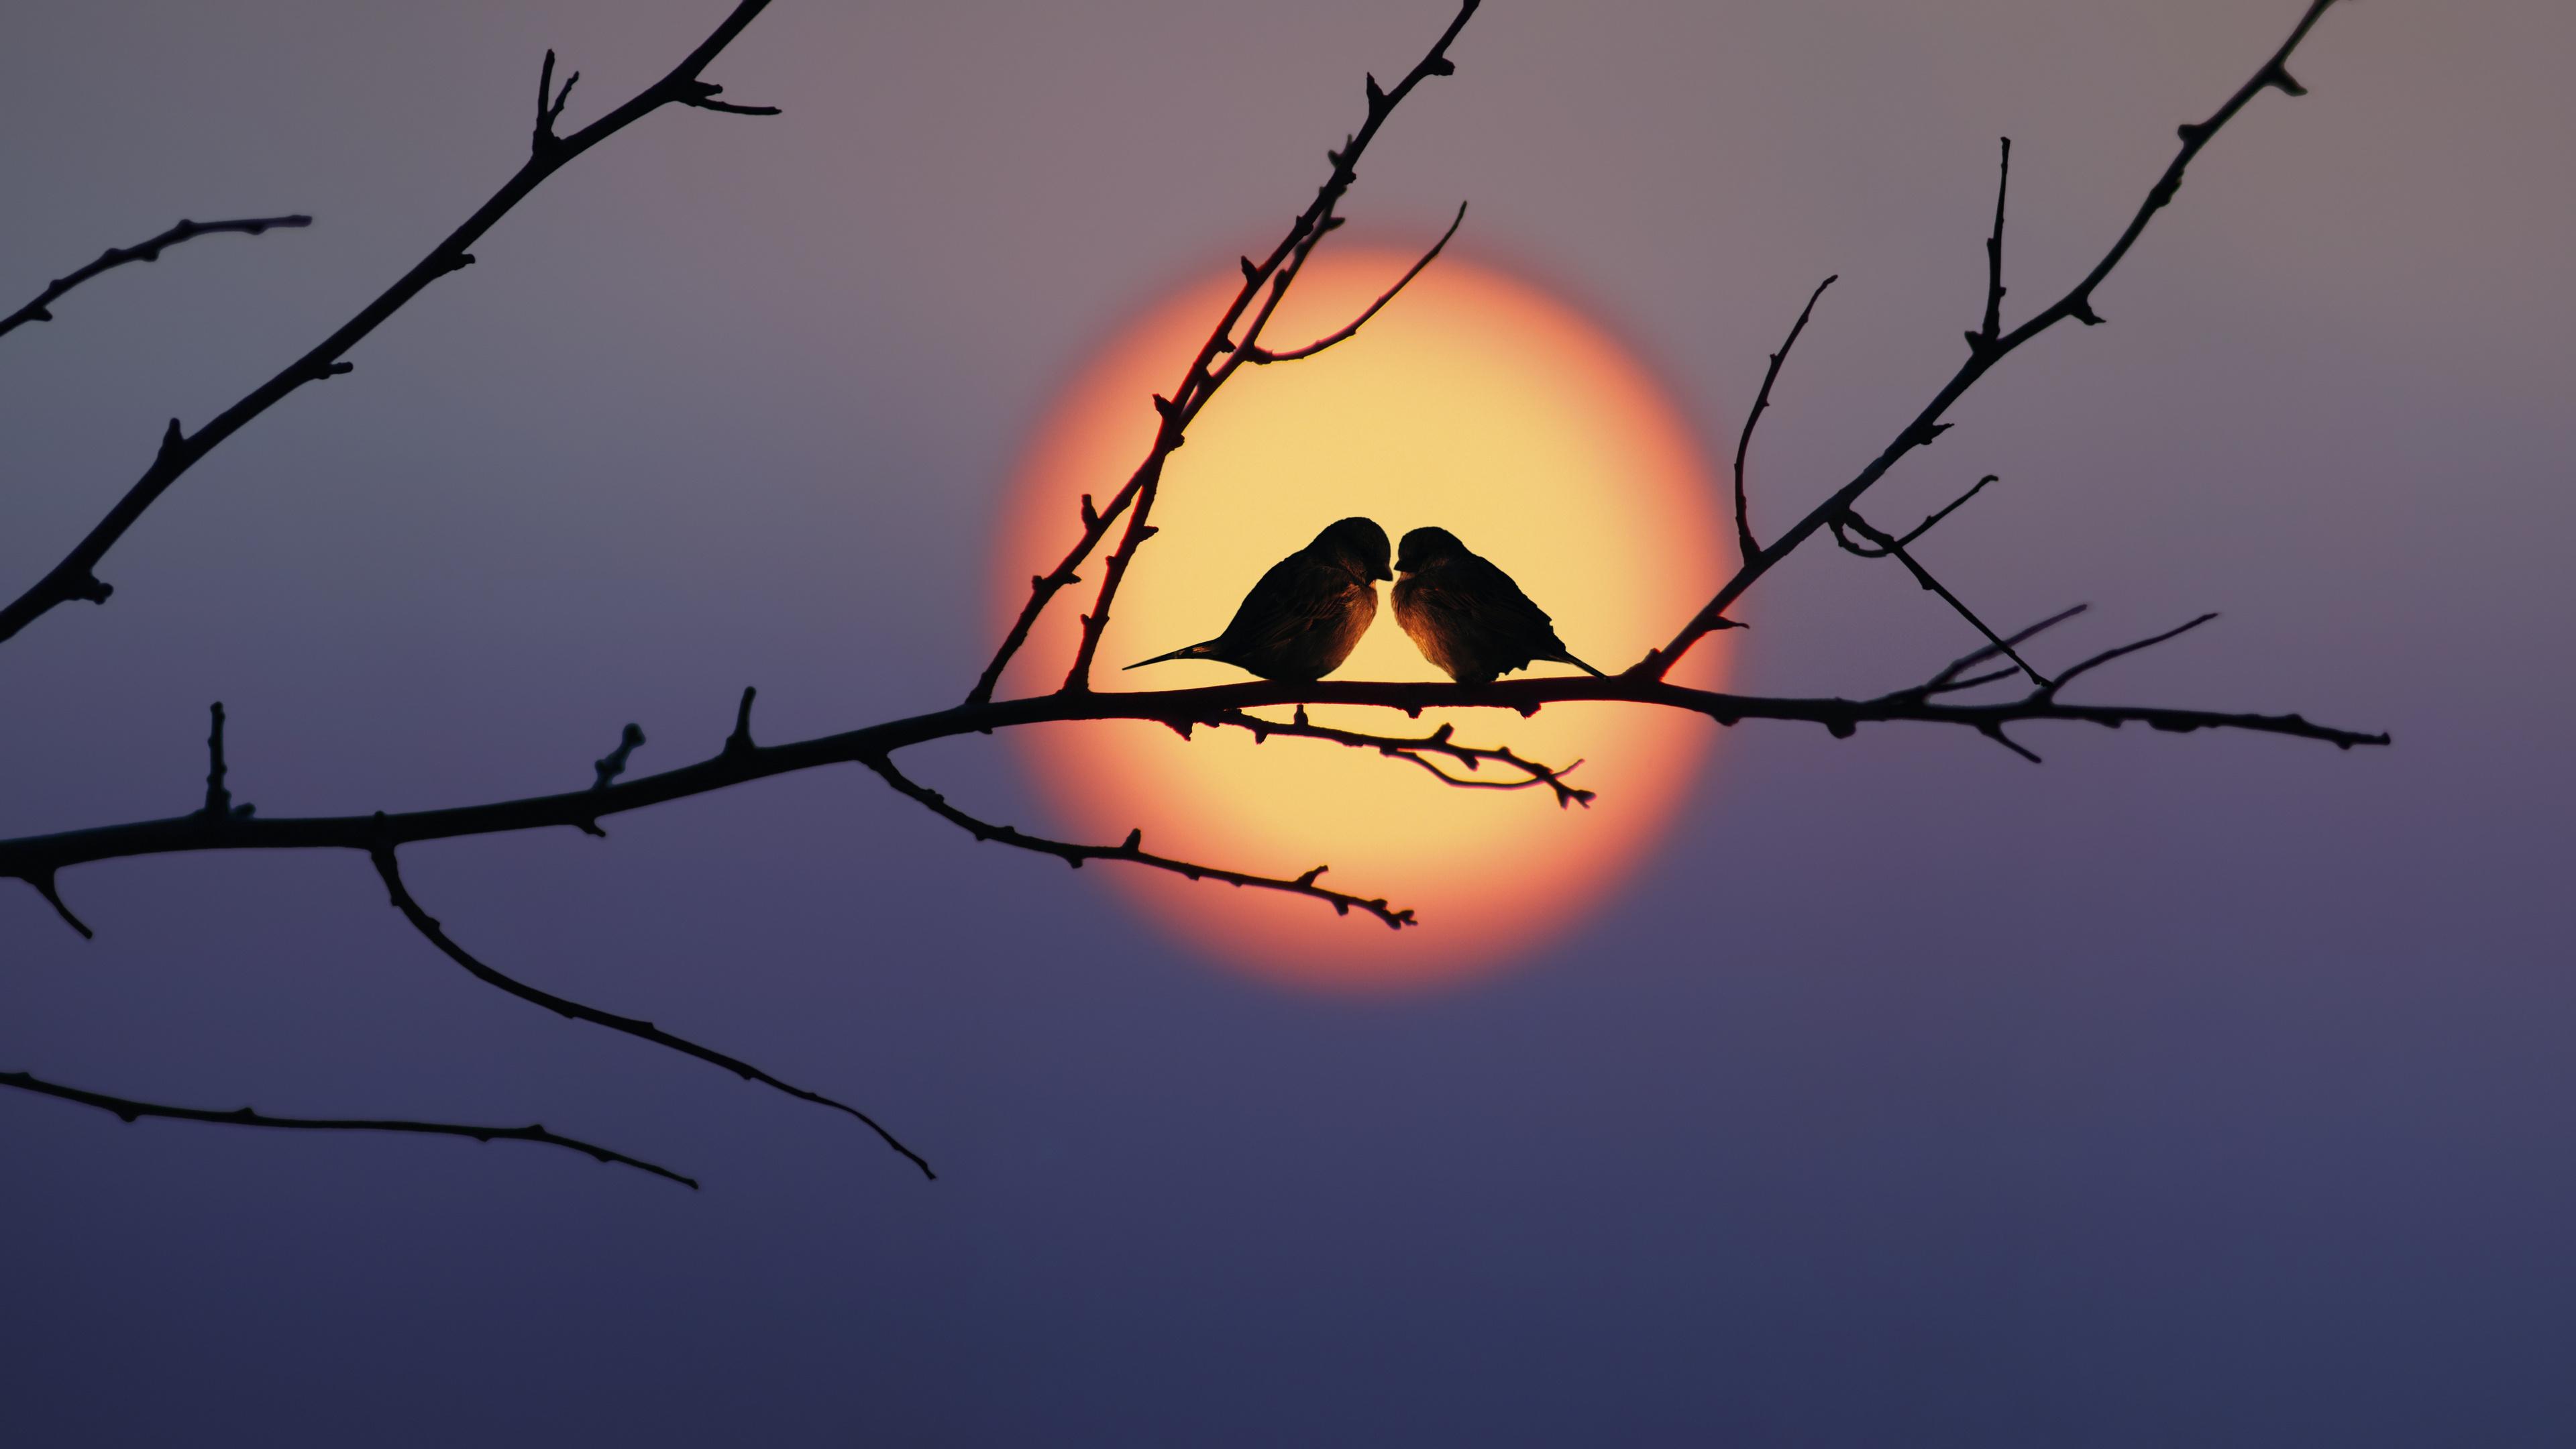 Картинка: Птицы, пара, на ветке, закат, вечер, солнце